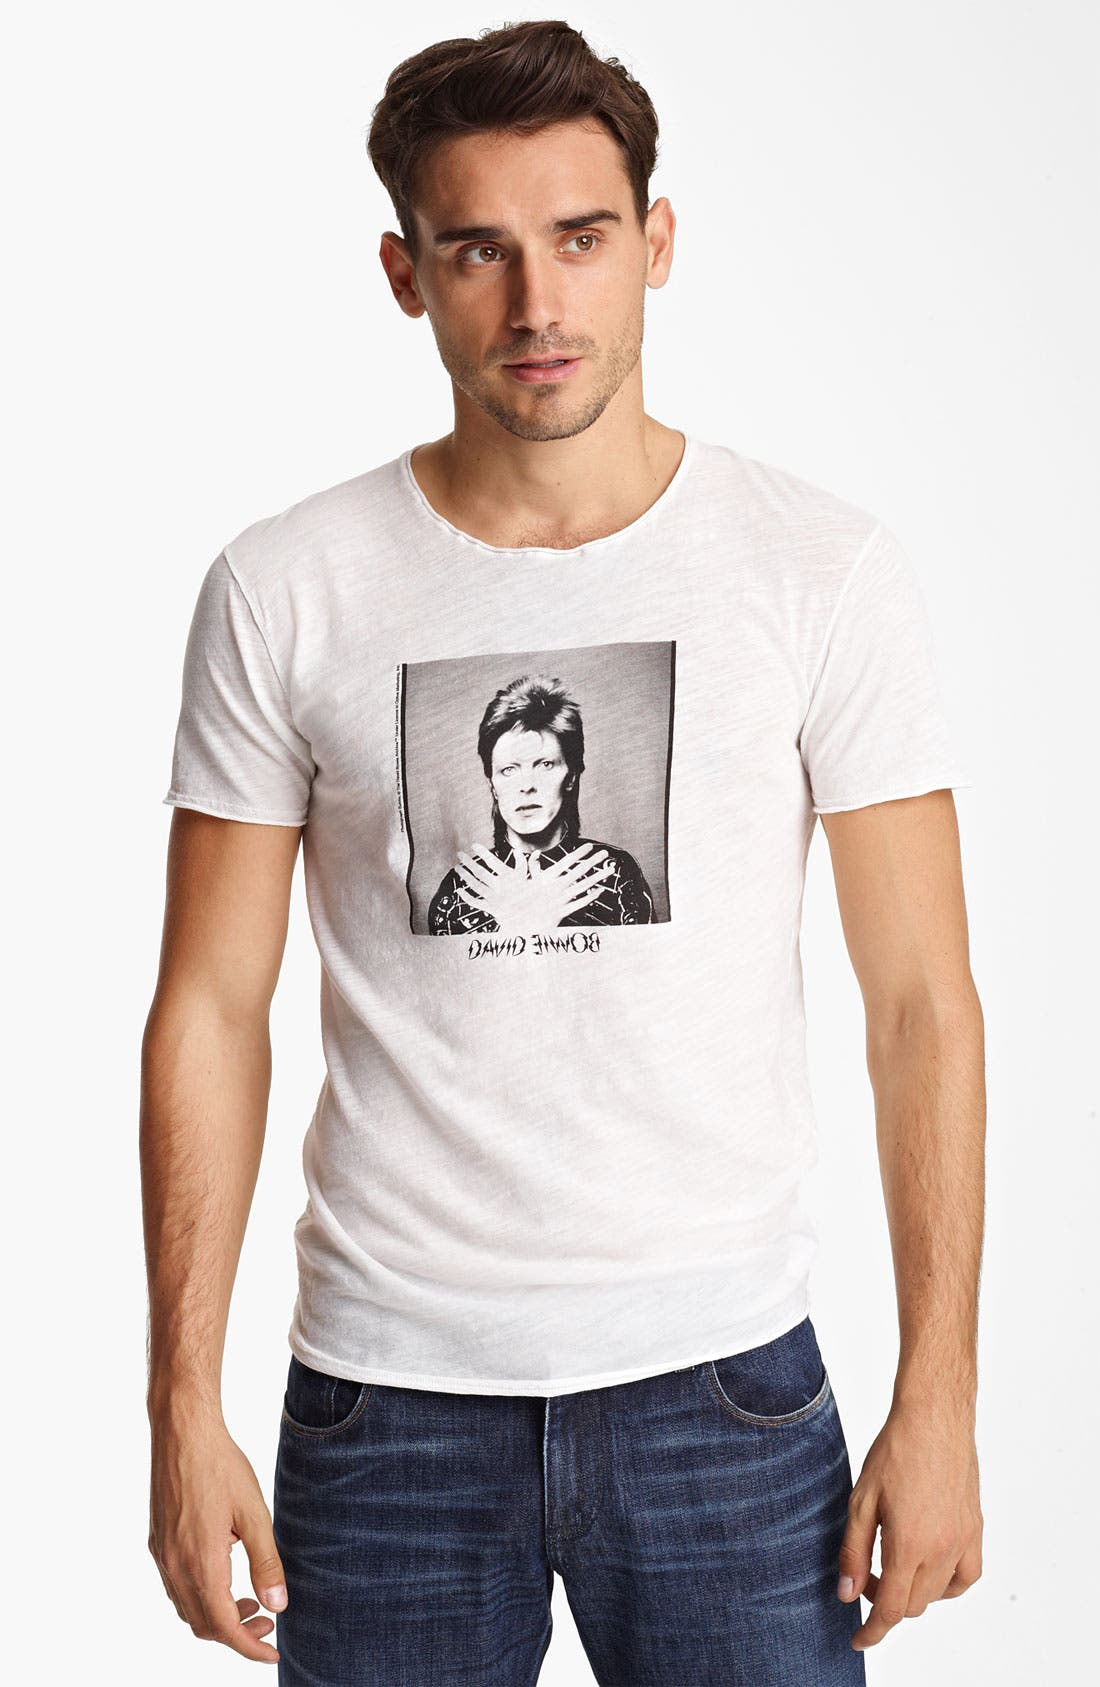 Main Image - Dolce&Gabbana 'David Bowie' Print T-Shirt